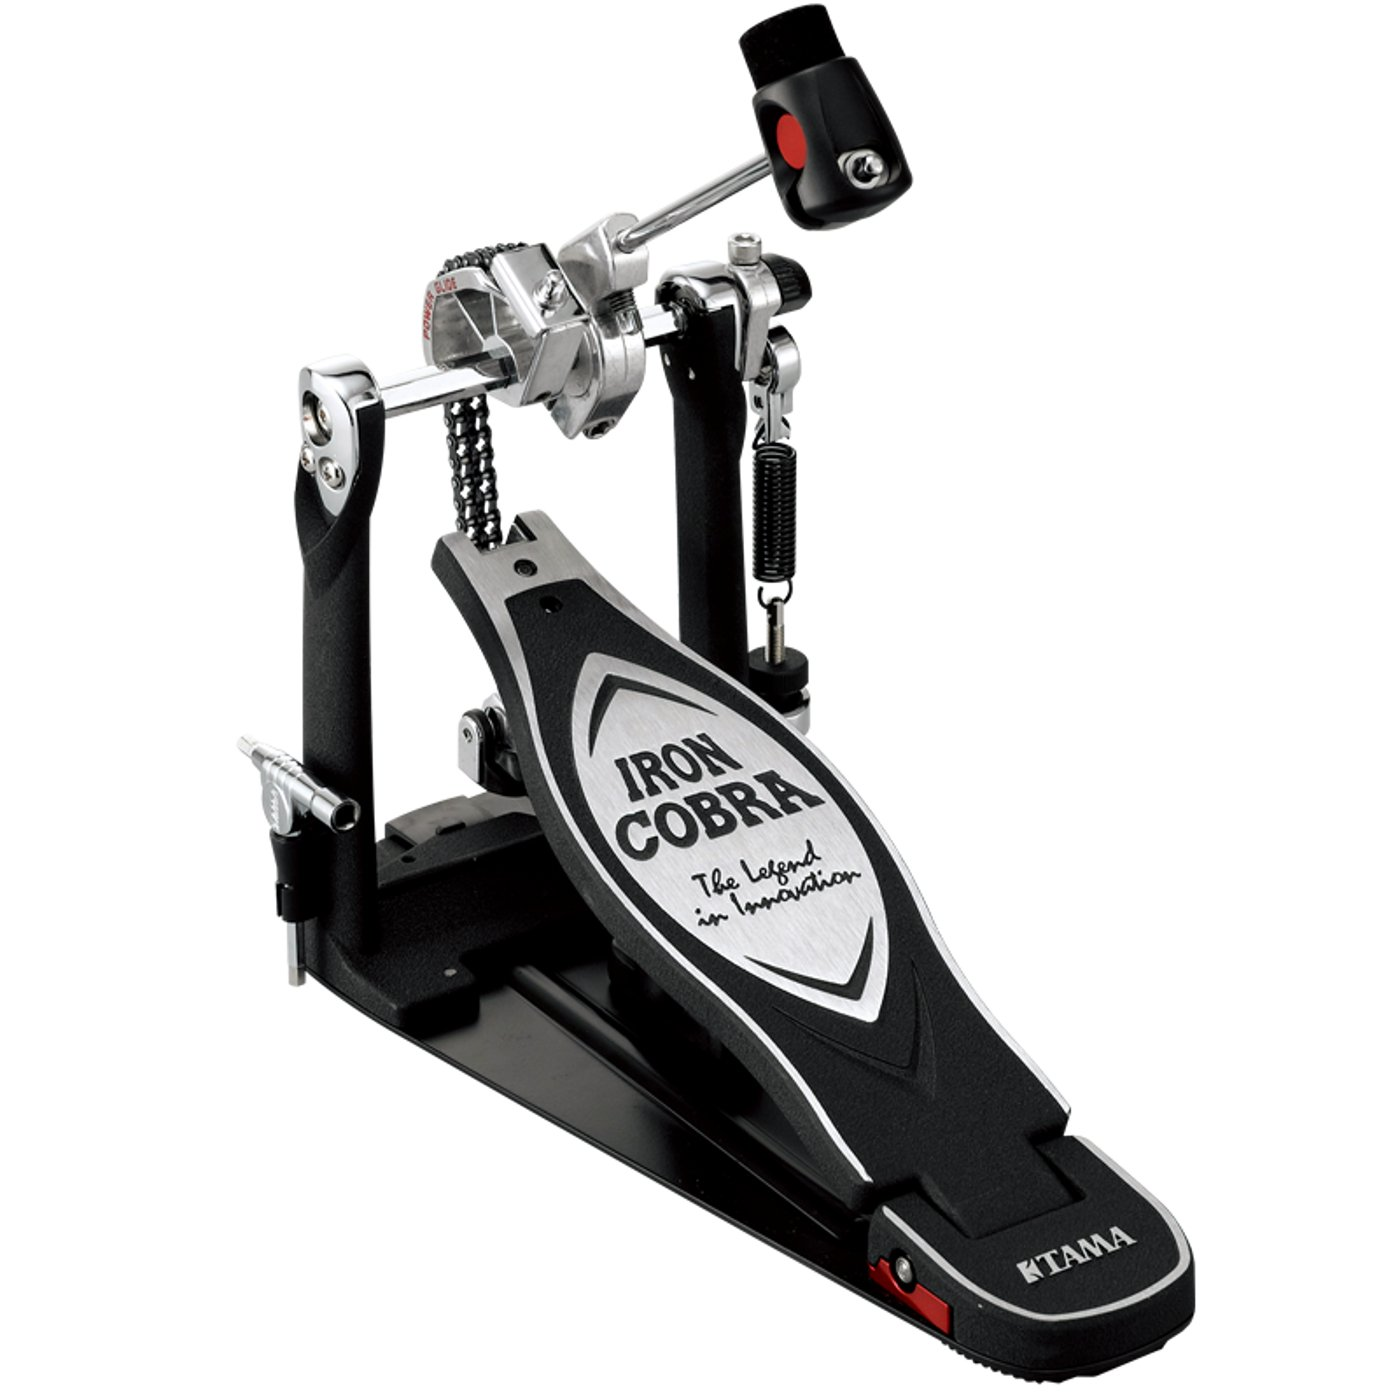 Iron Cobra 900 Power Glide Single Pedal